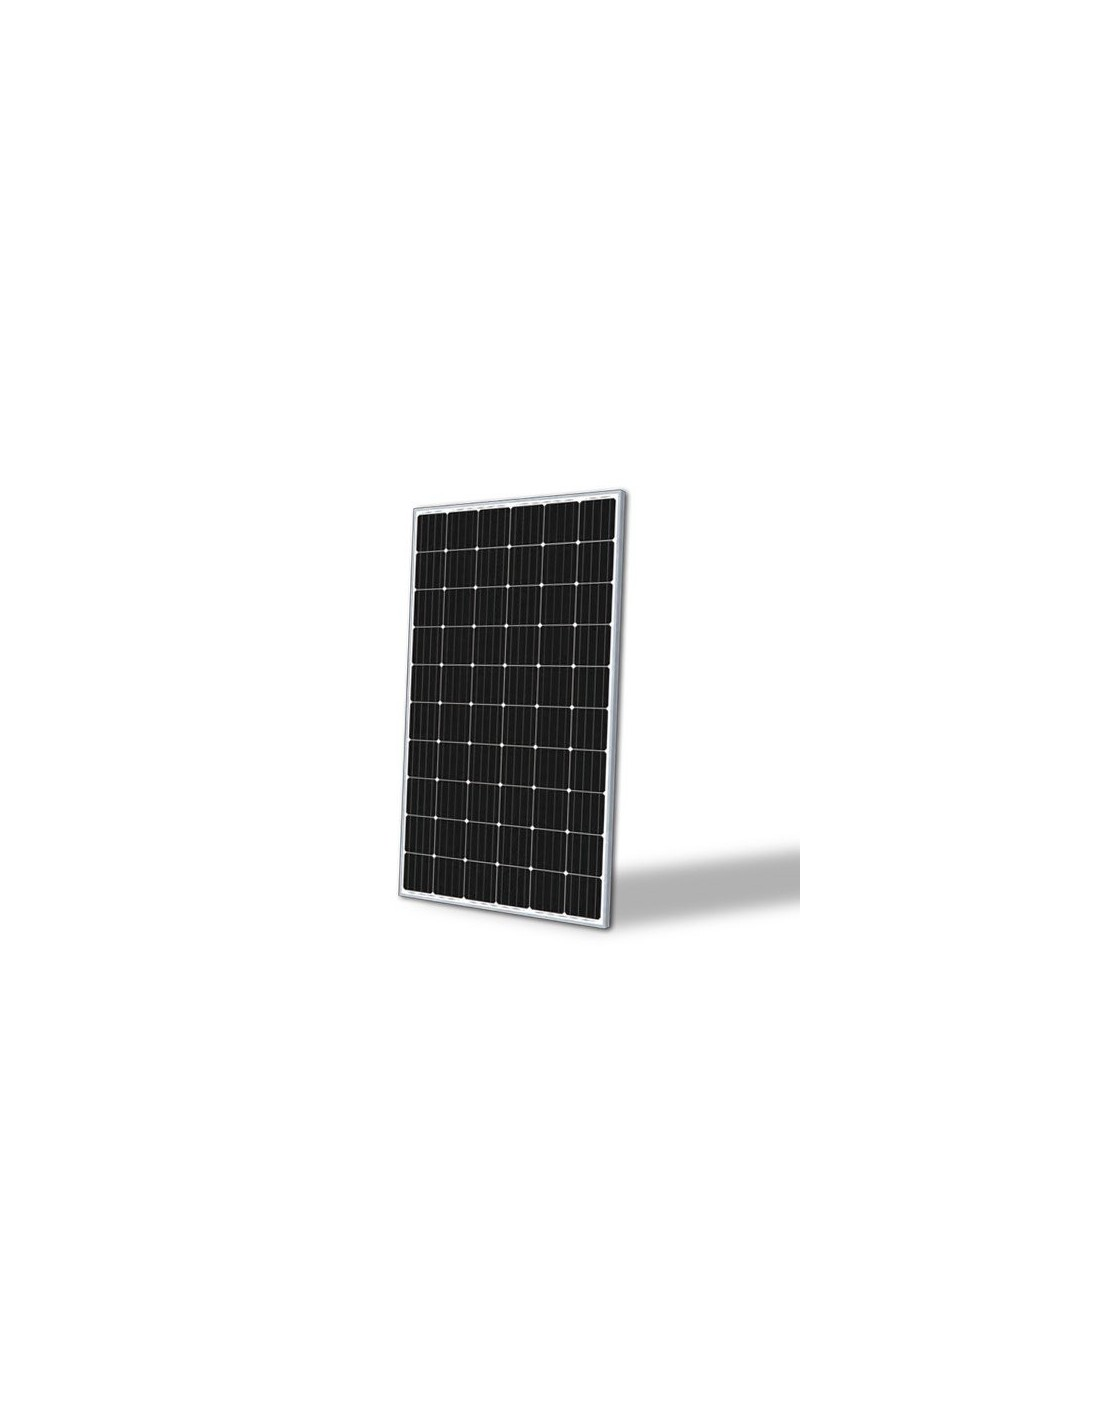 Kit Pannello Solare 12v : Kit solare w v tr pro pannello regolatore mppt